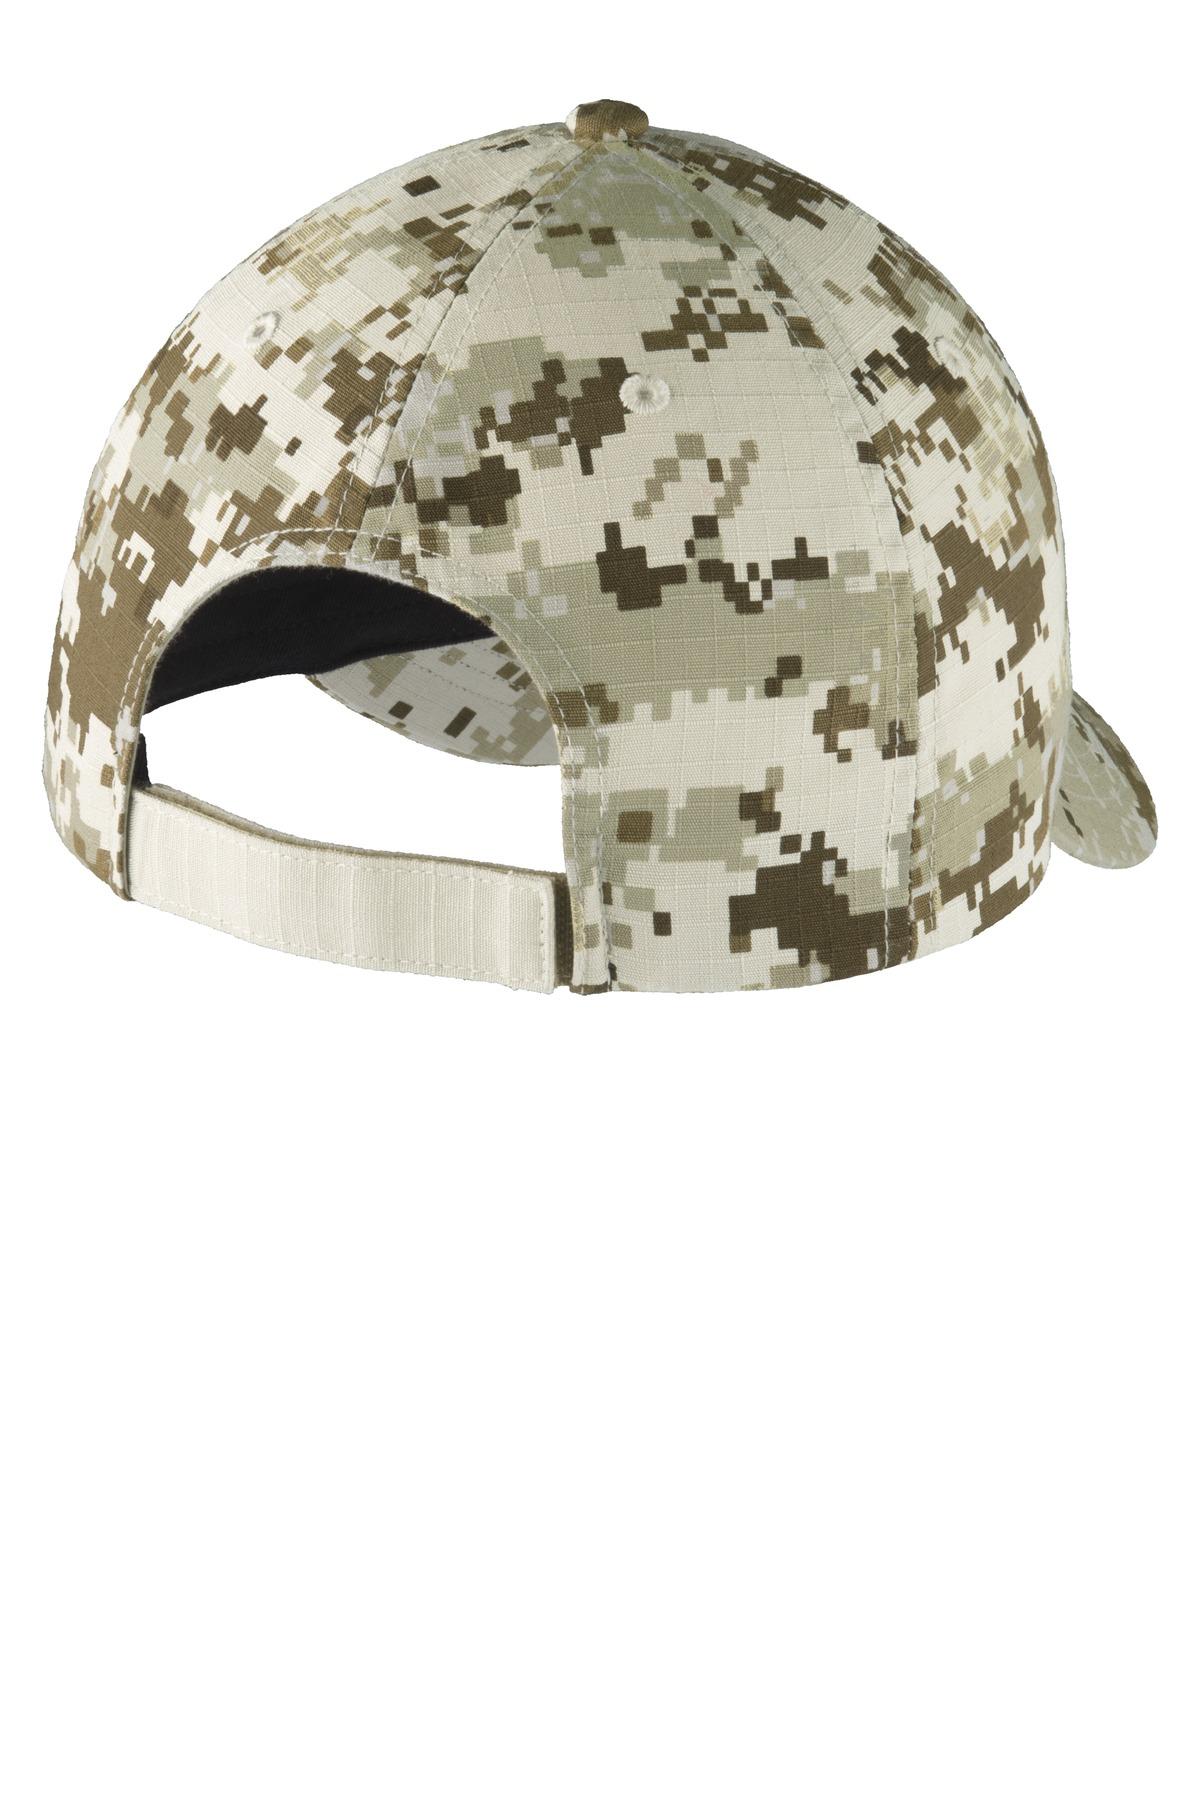 Port Authority?C926 Colorblock Digital Ripstop Camouflage Cap